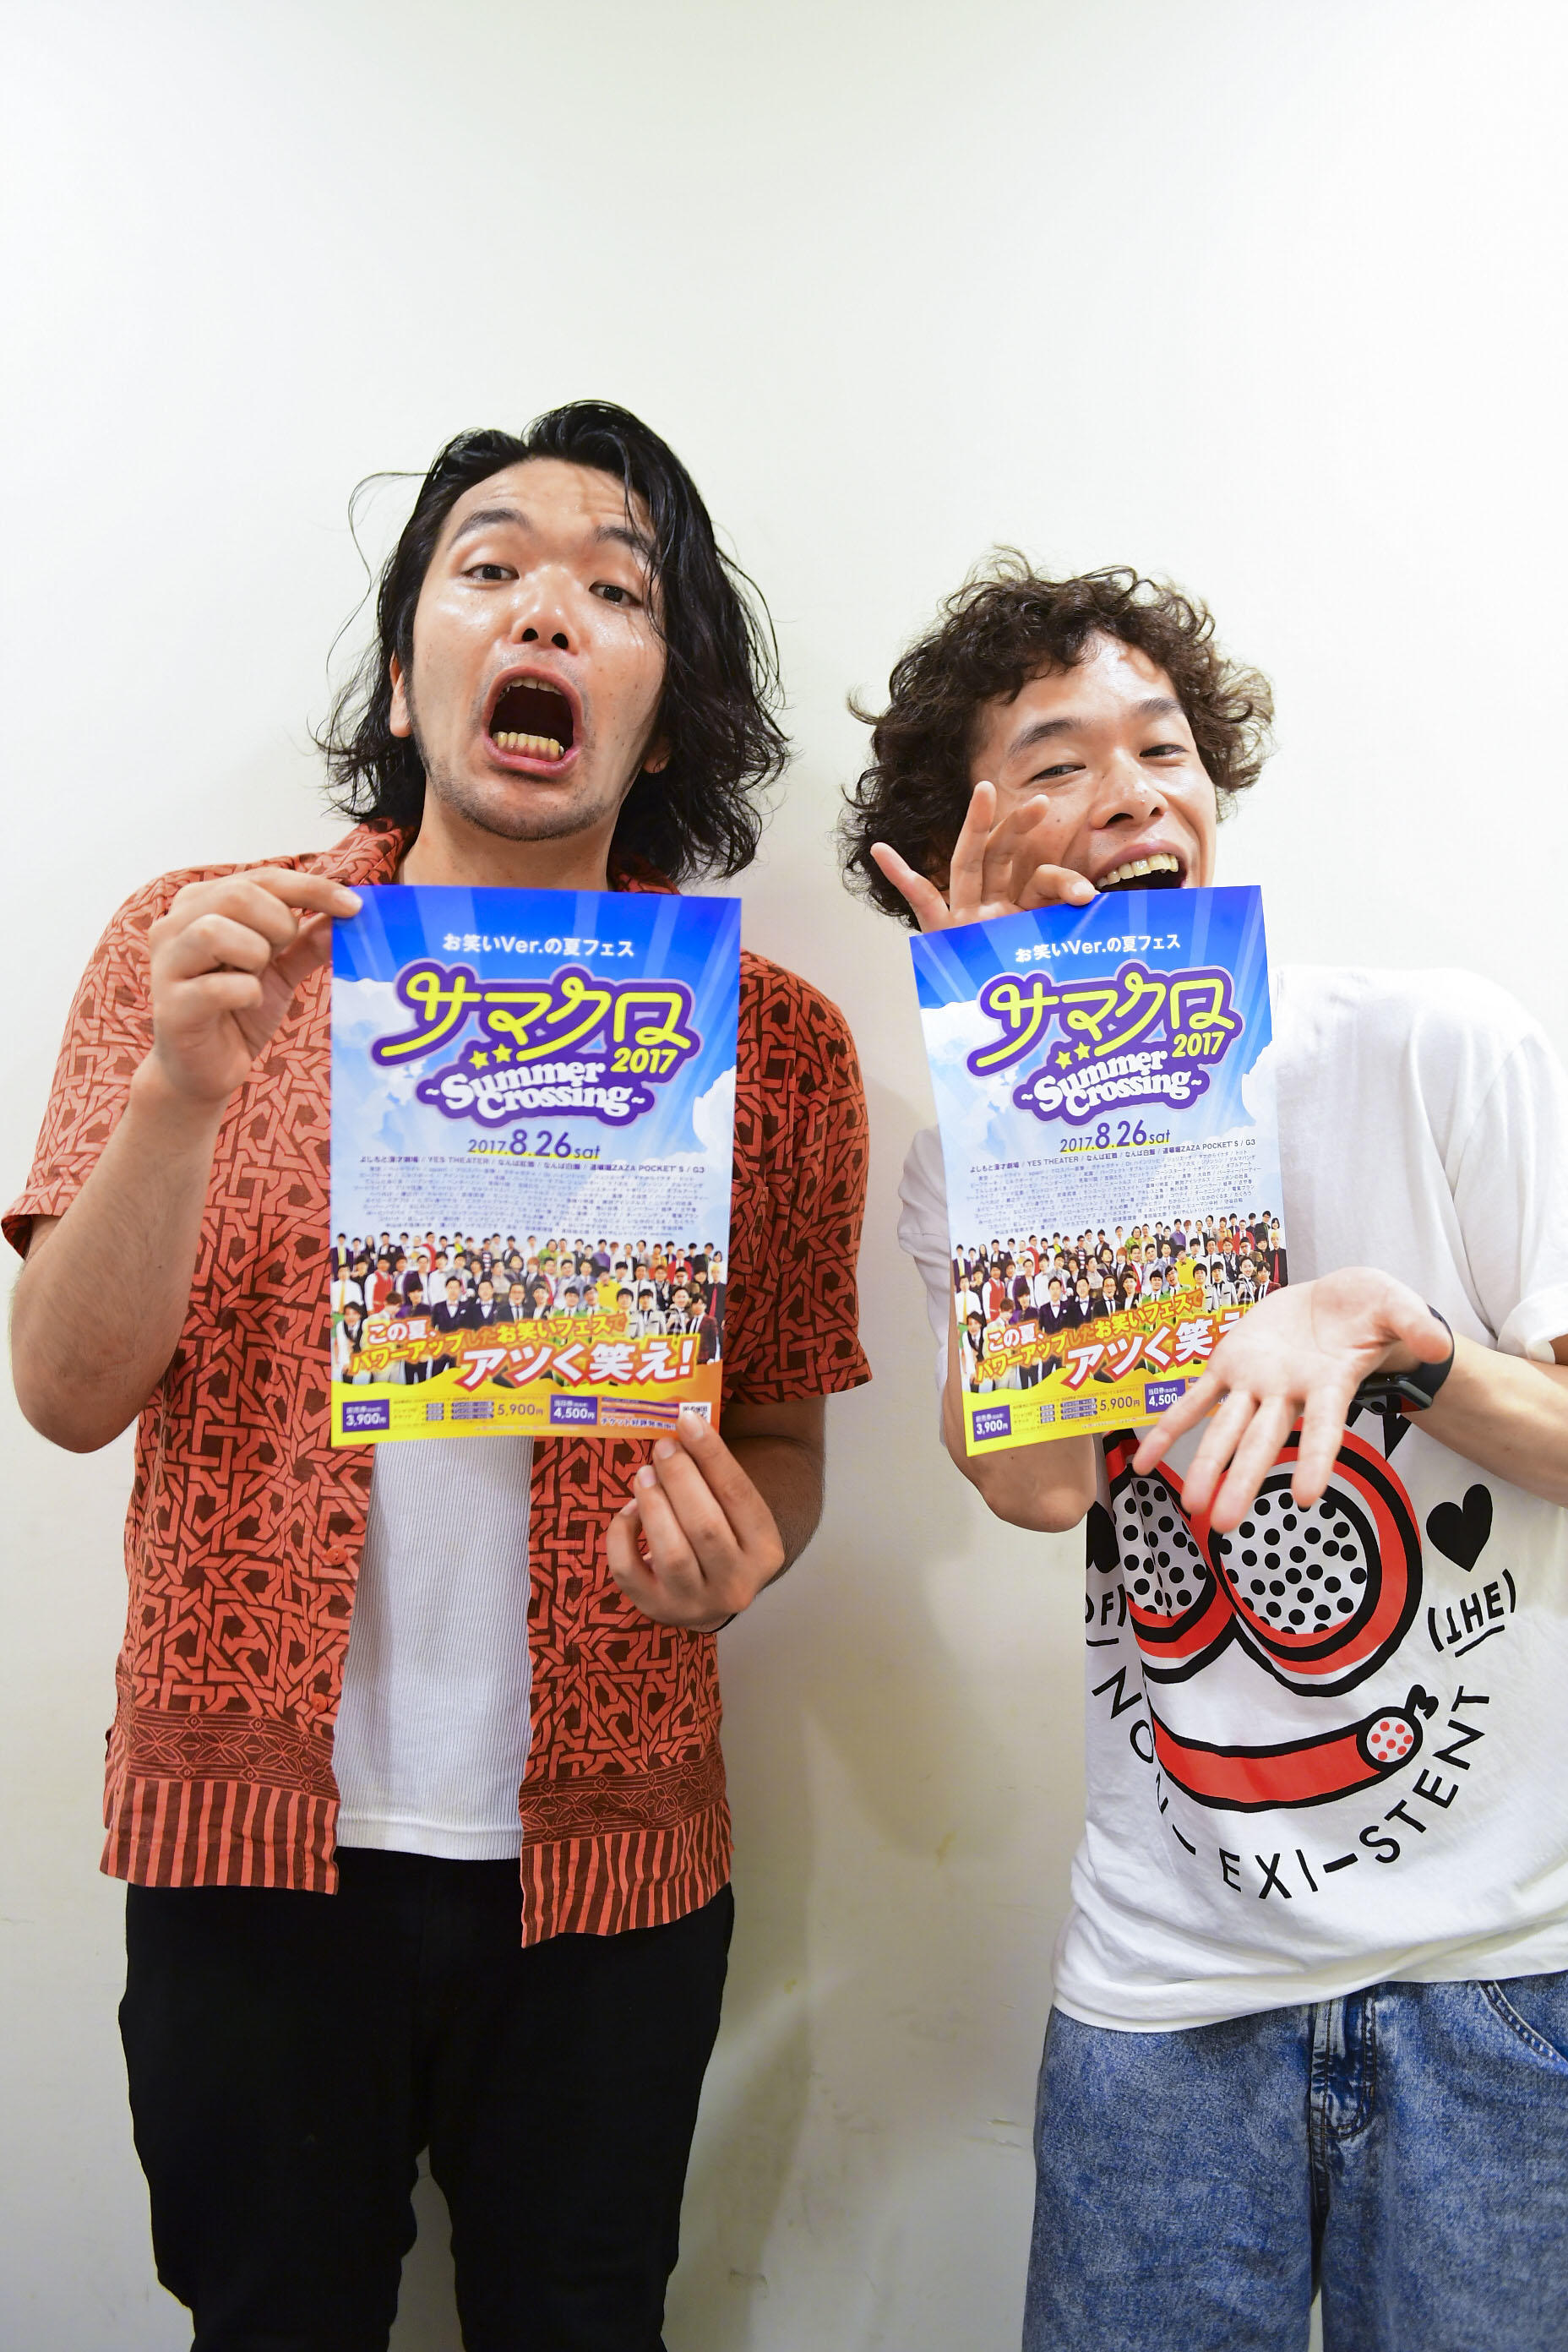 http://news.yoshimoto.co.jp/20170805100042-019f20dc6ebce1caf194cfeac25e85997dcaf62a.jpg